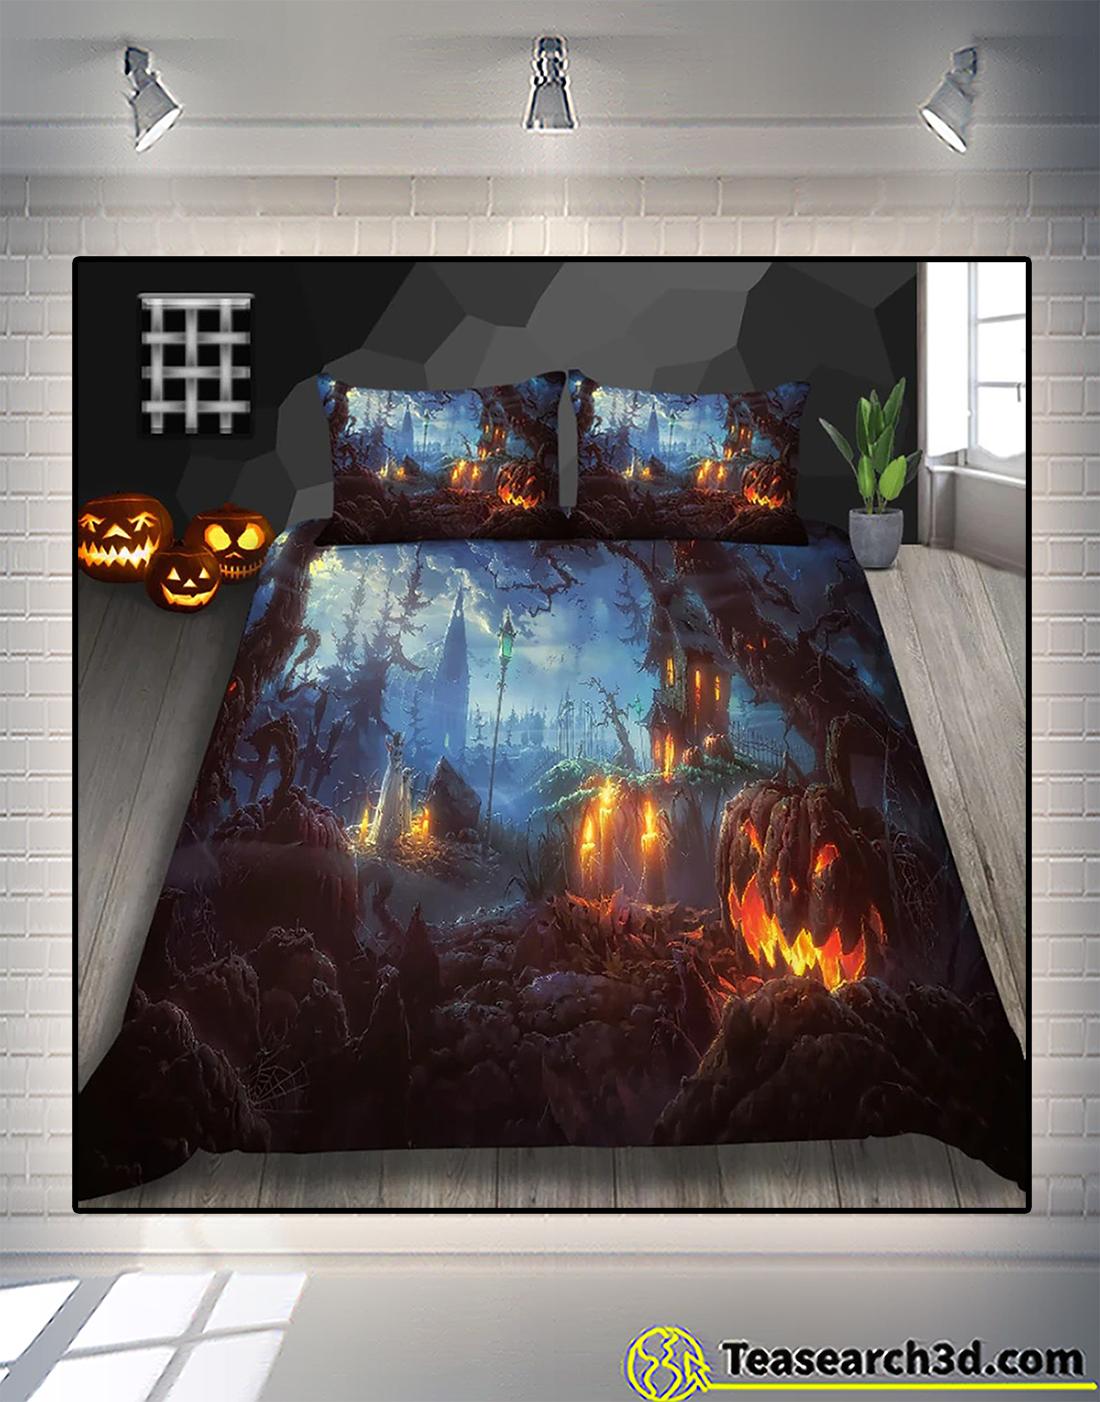 All hallows pasture halloween bedding set 2